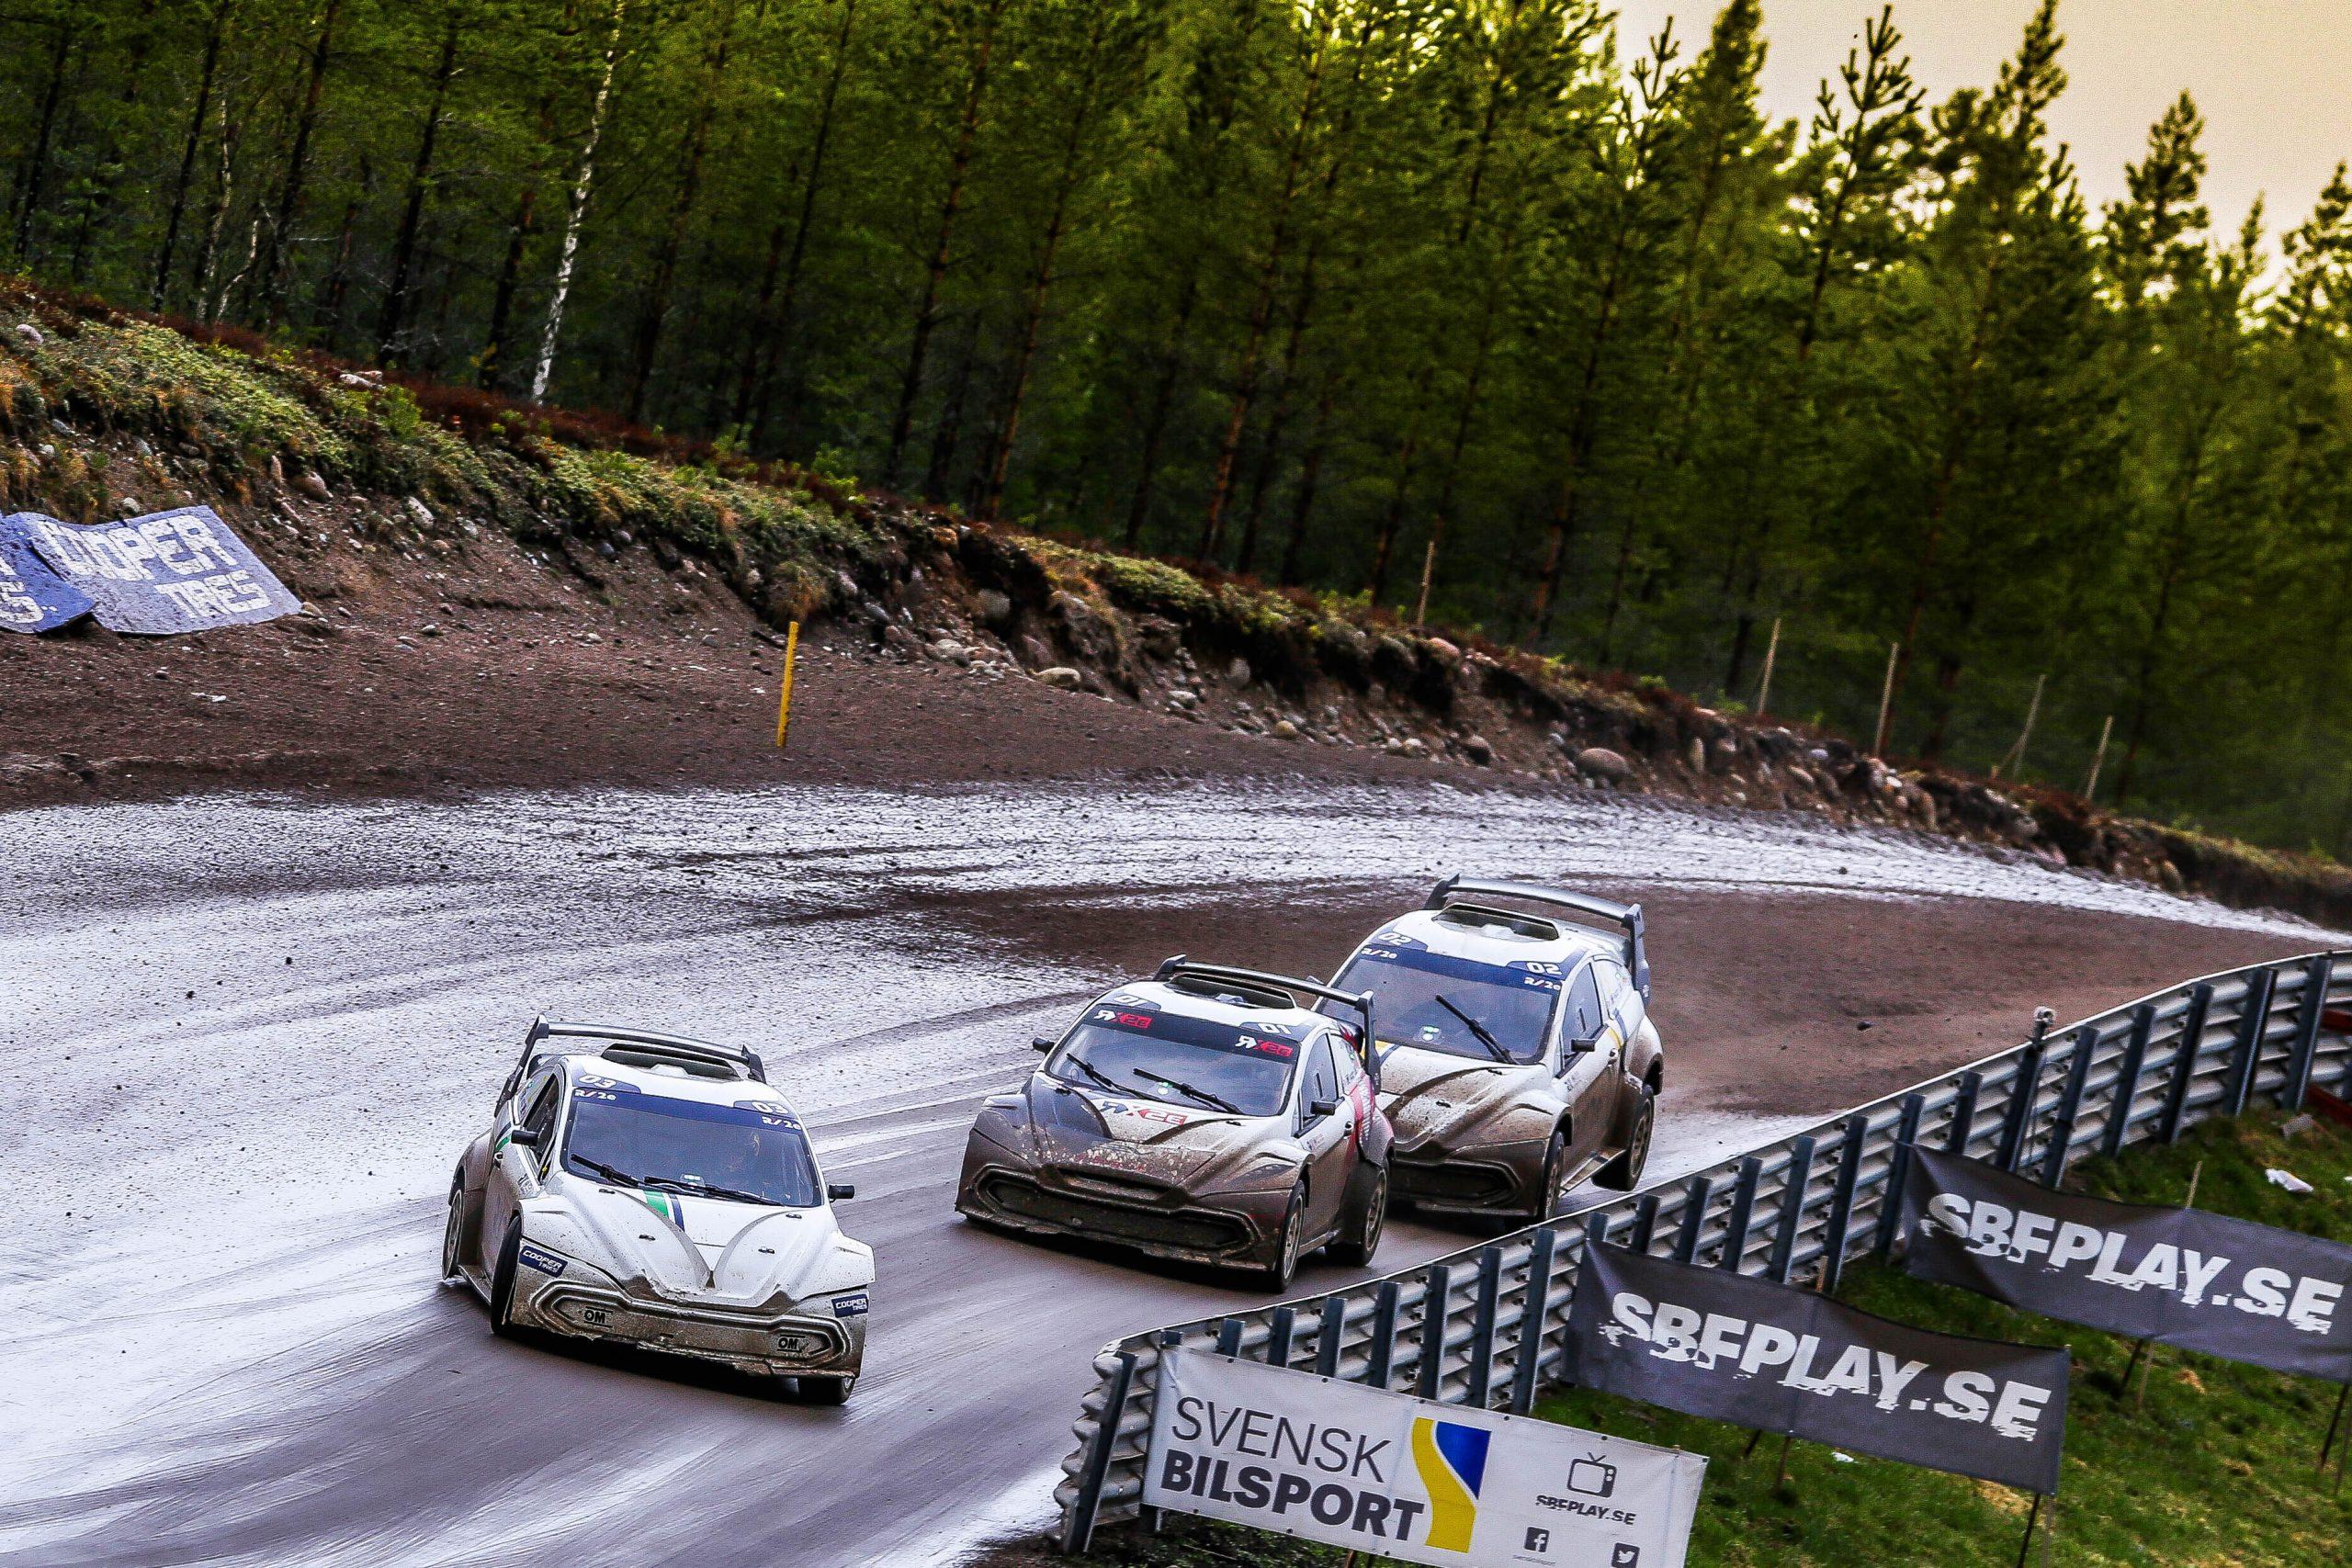 FIA RX2e Championship car impresses rallycross elite as Superteam Challenge at Höljes demonstrates electric potential, QEV